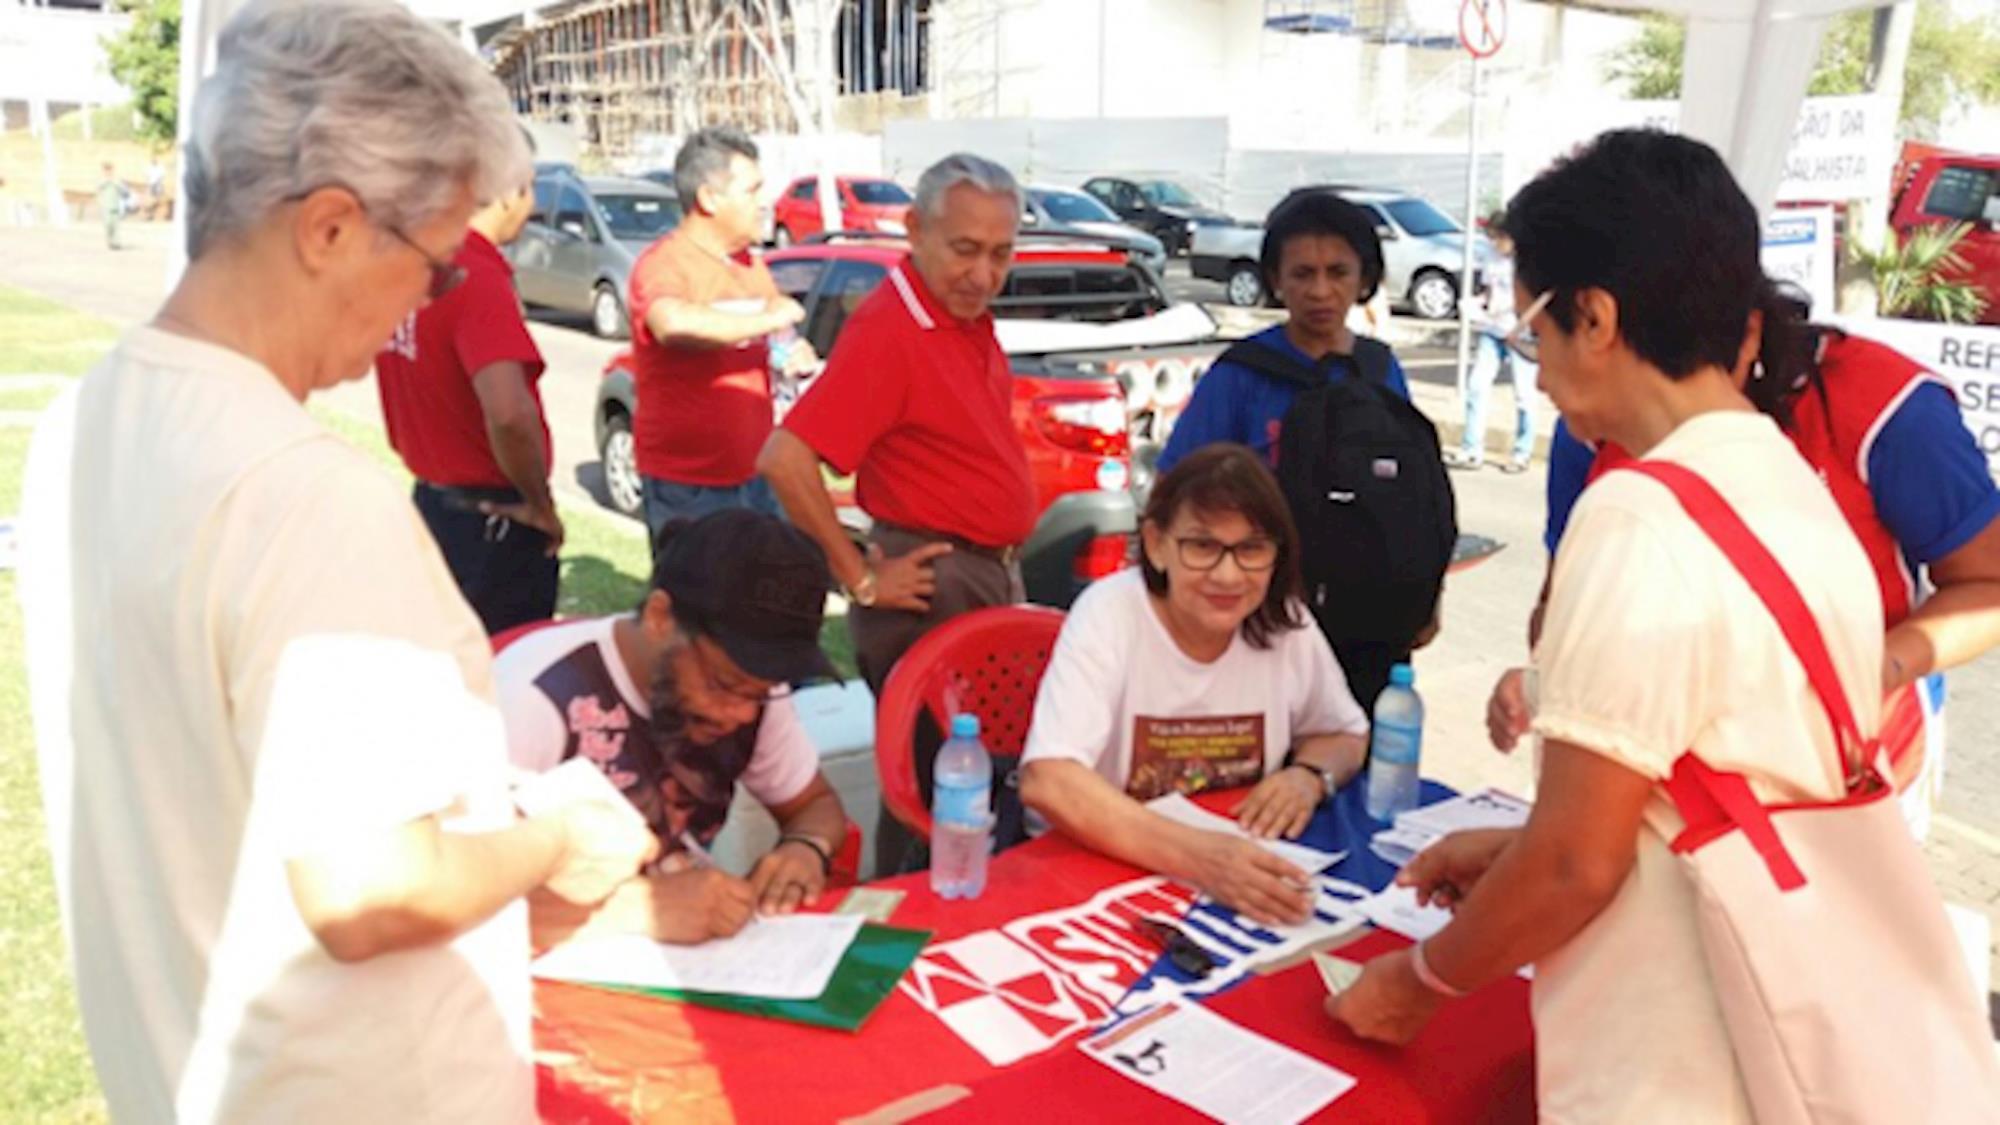 imprensa, Socorro Silva/CUT-PI